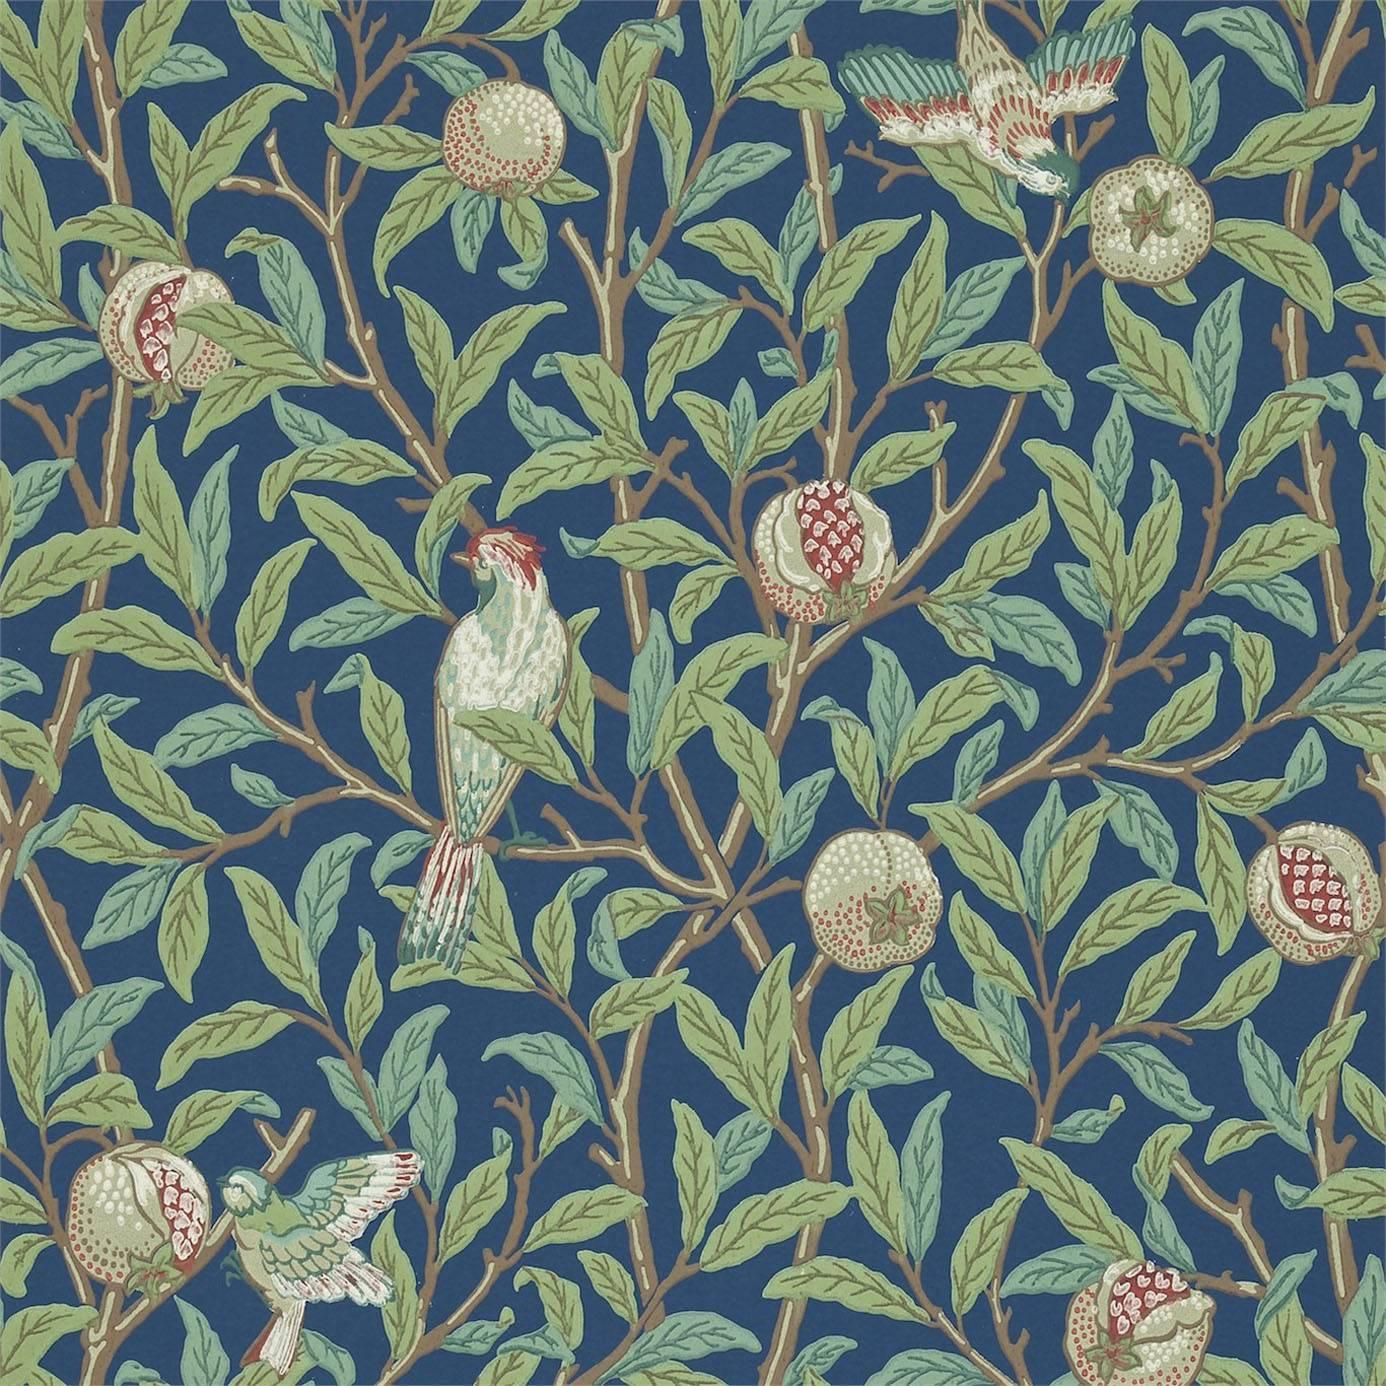 Archive 2 Wallpapers Bird Pomegranate Wallpaper   BlueSage   212540 1386x1386